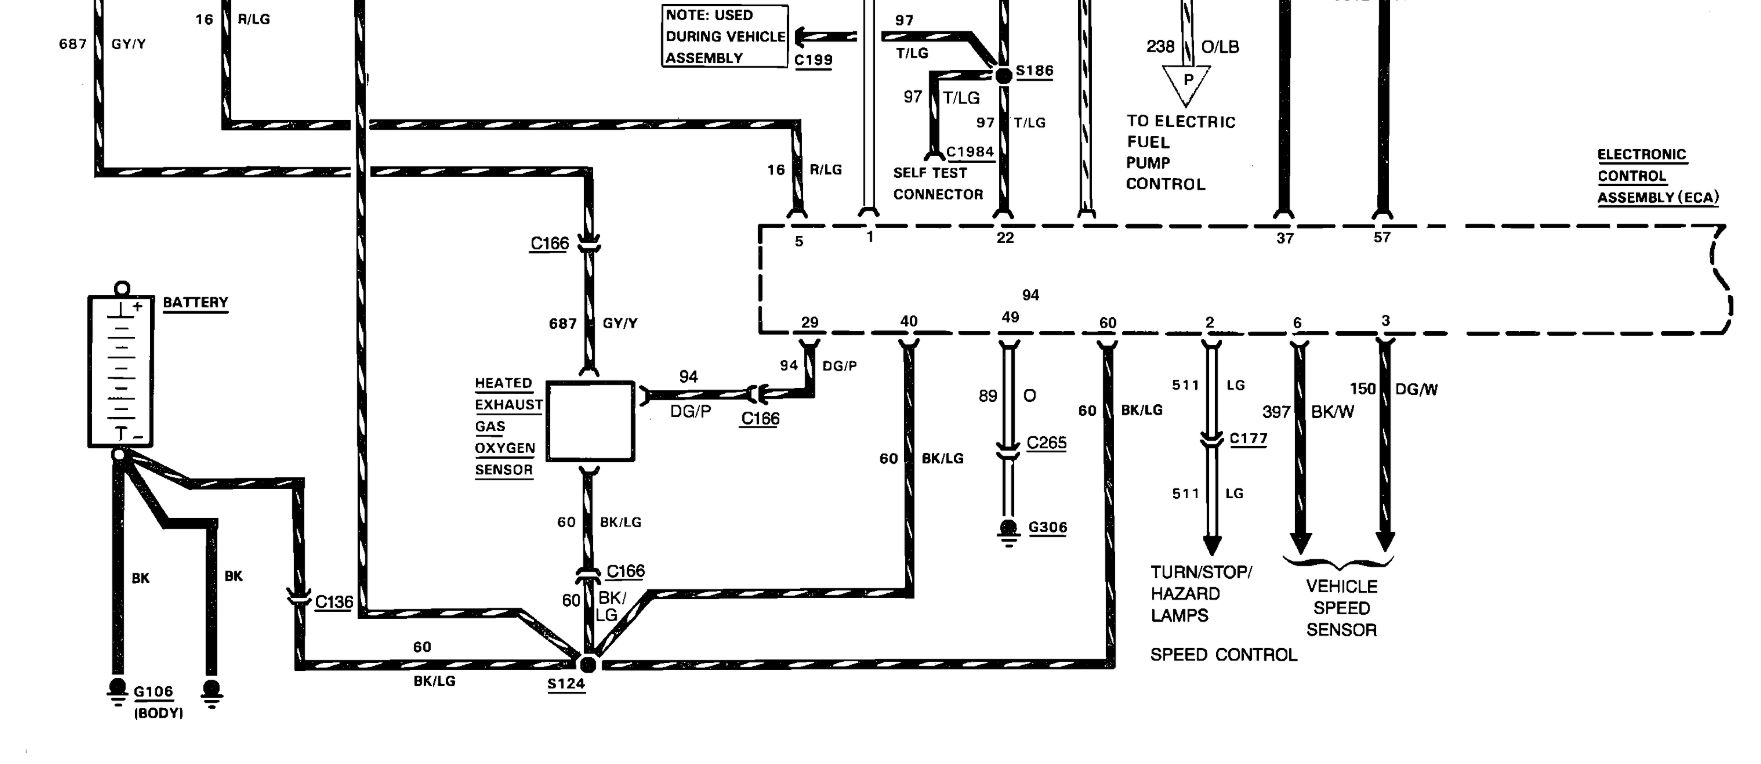 1990 Ford Ranger Fuel Pump Wiring Diagram Wiring Diagram Sonata Sonata Graniantichiumbri It